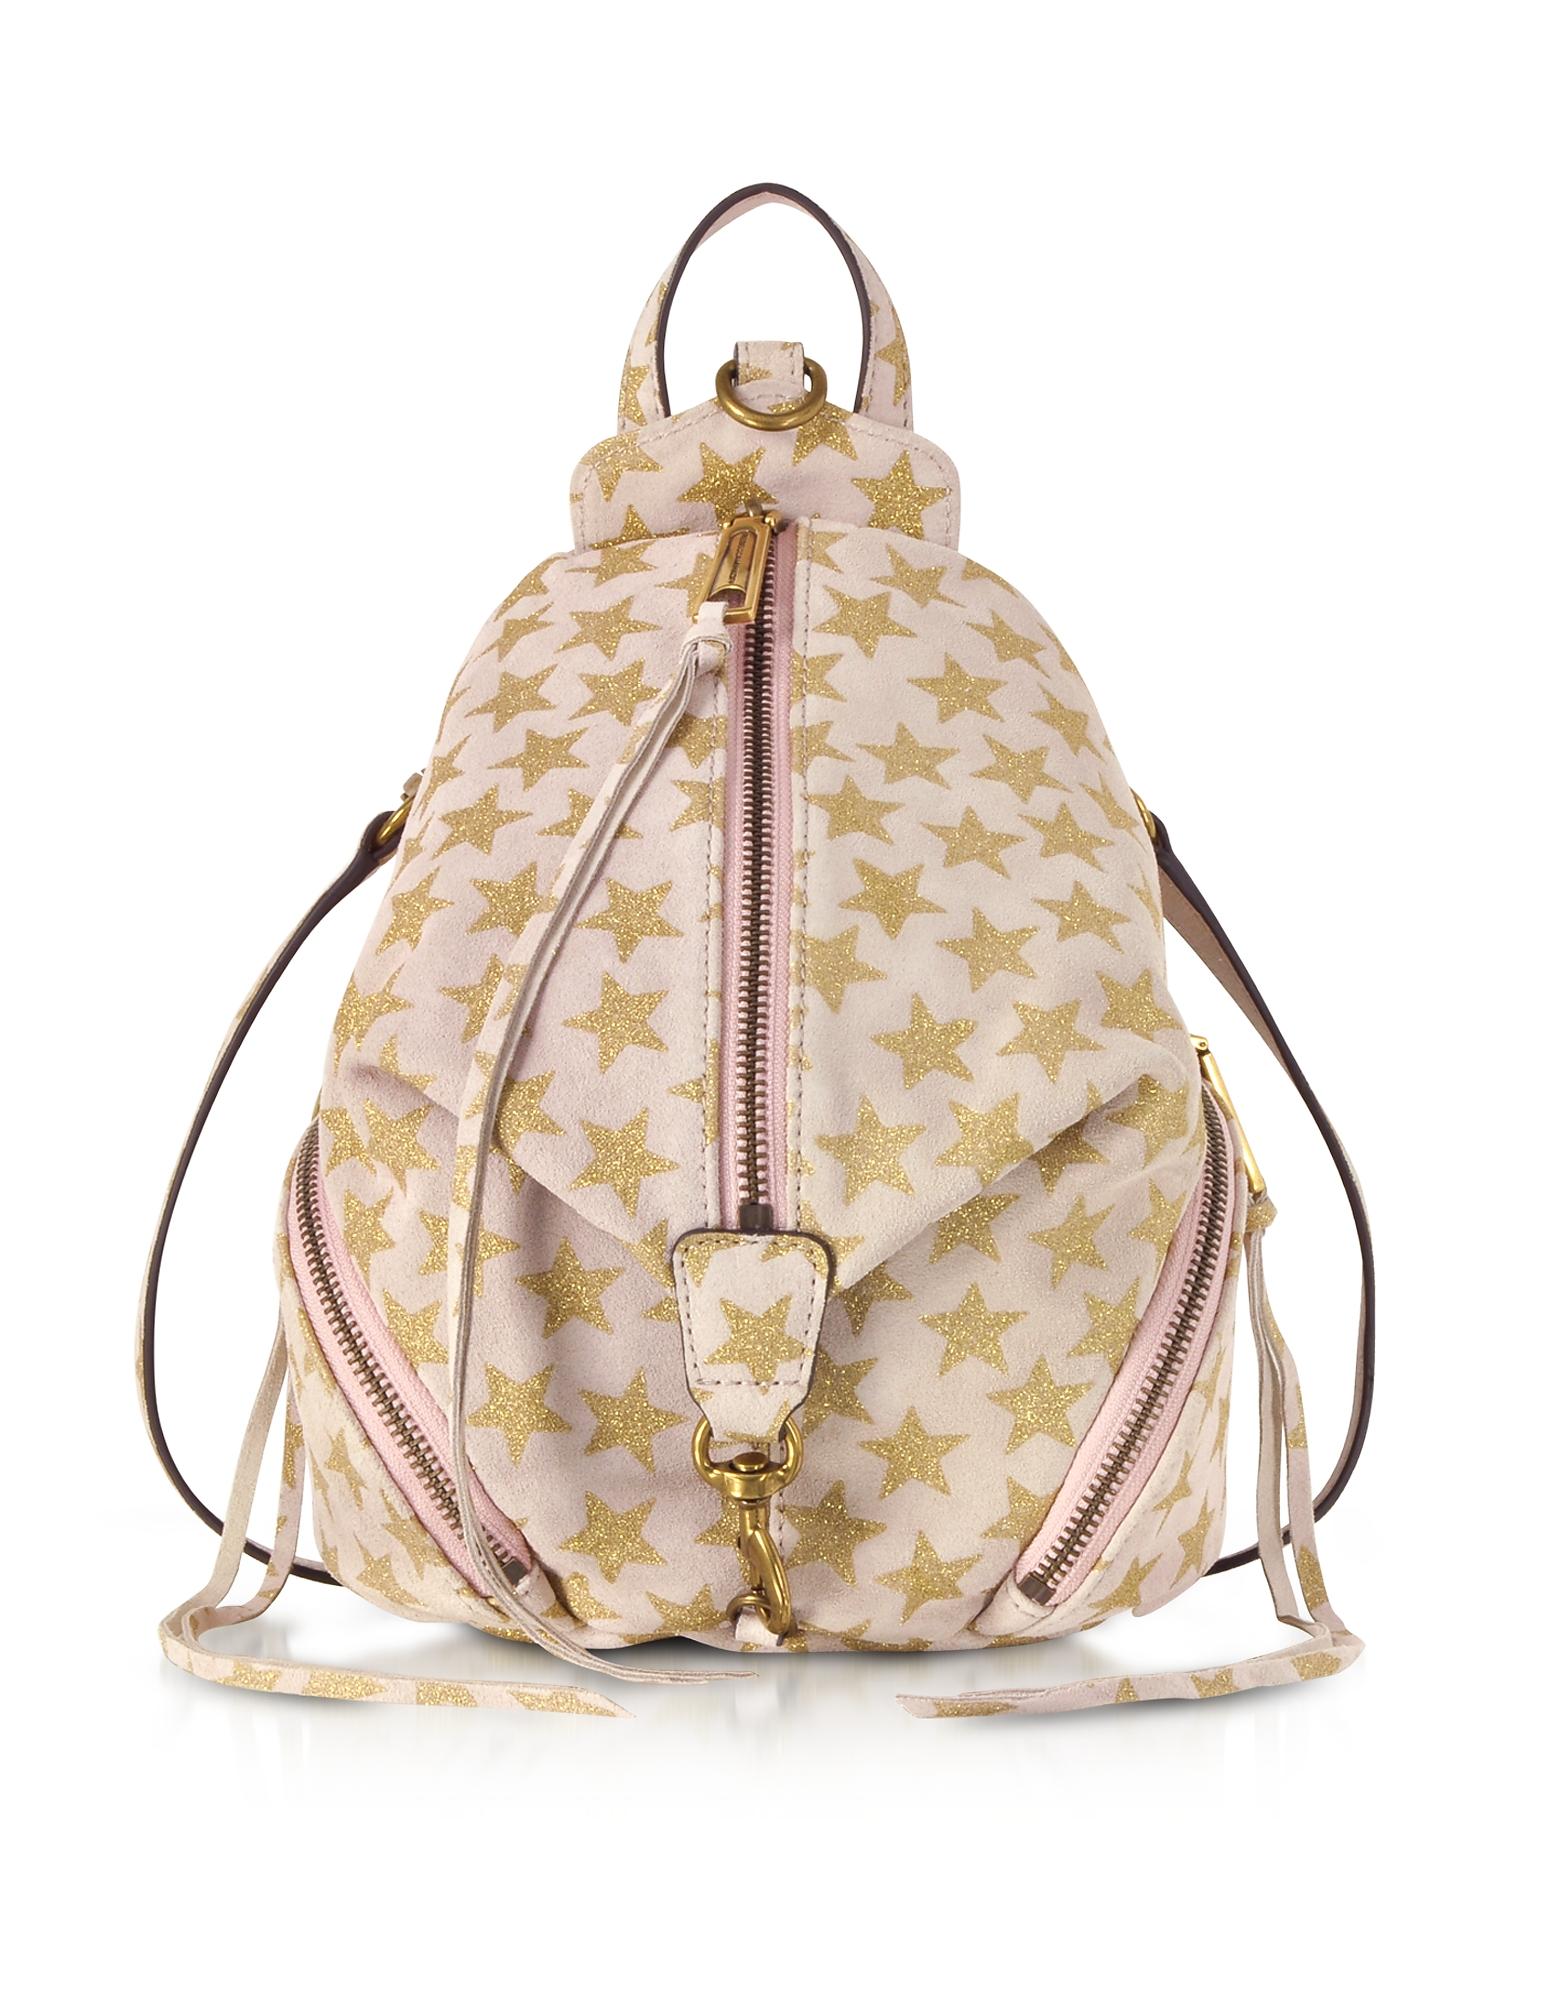 Rebecca Minkoff Handbags, Nude Leather Convertible Mini Julian Backpack w/Stars